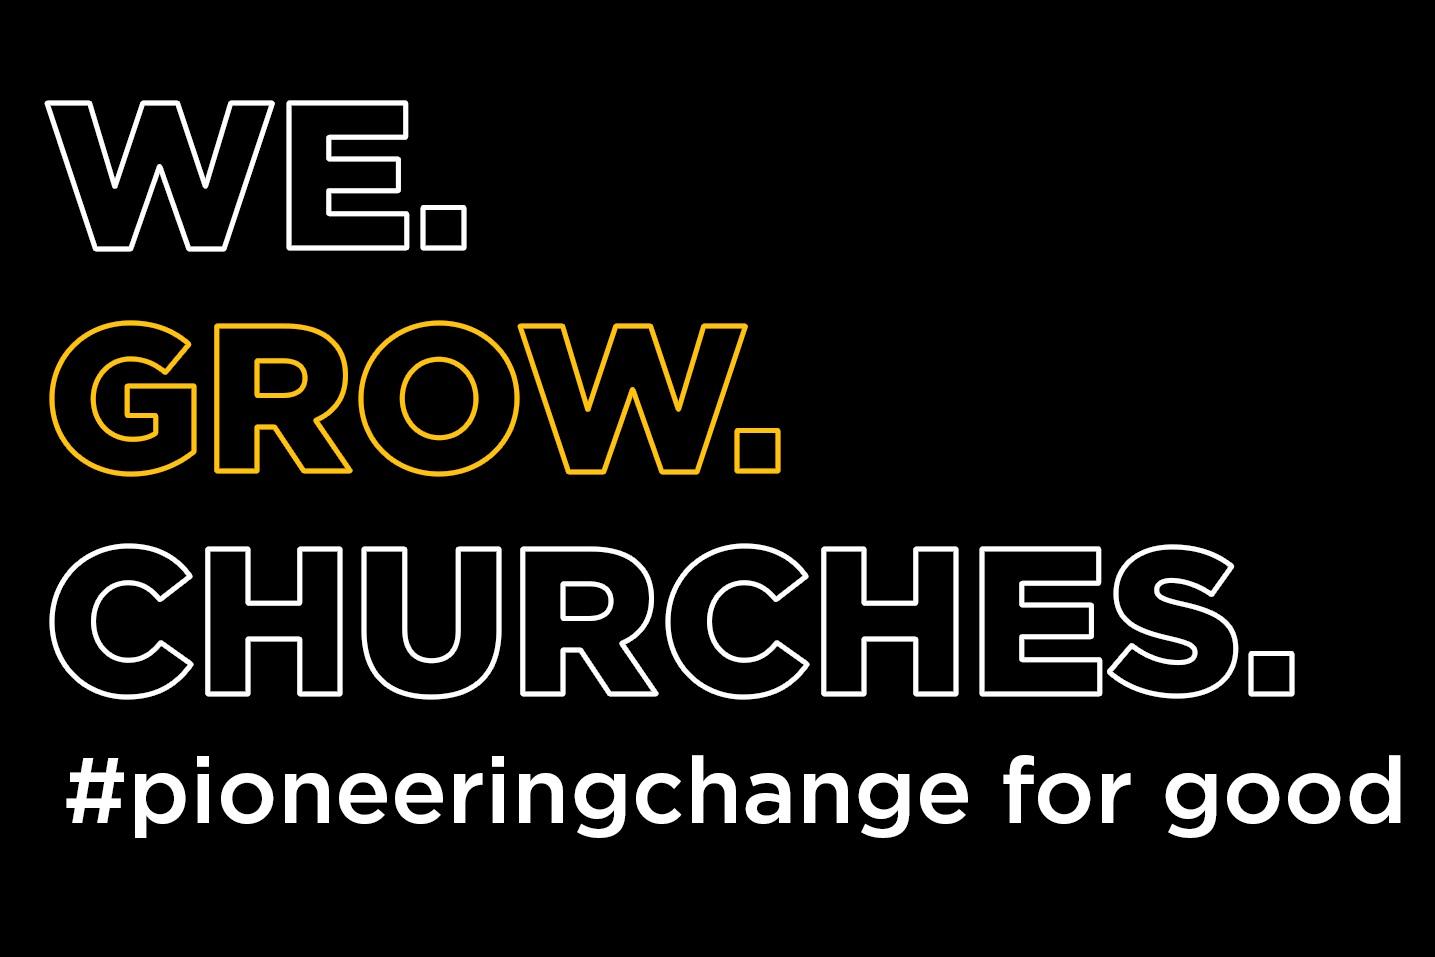 We_Grow_Churches-2.jpg